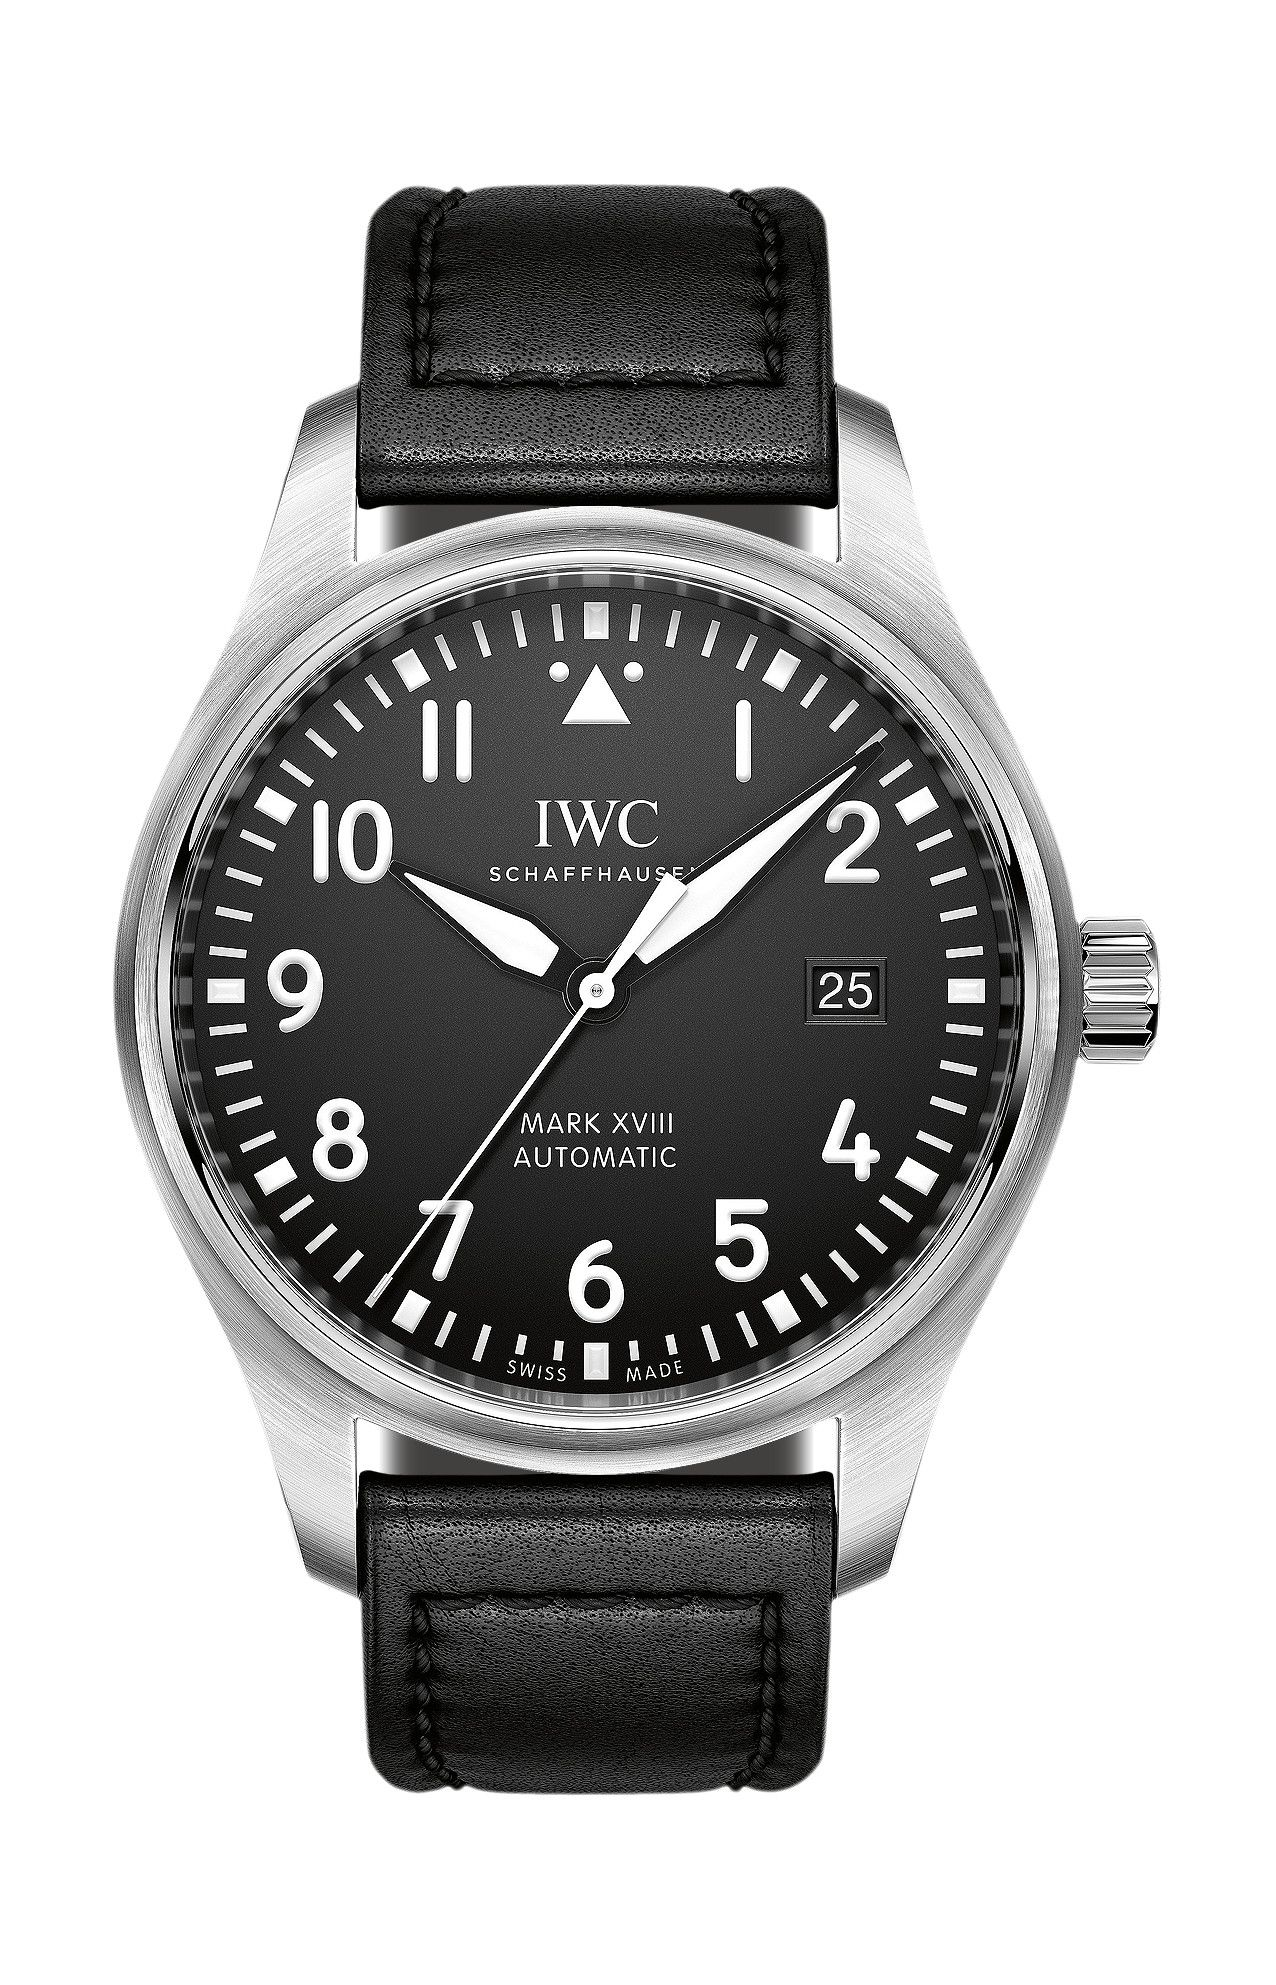 PILOT'S WATCH MARK XVIII - IW327009